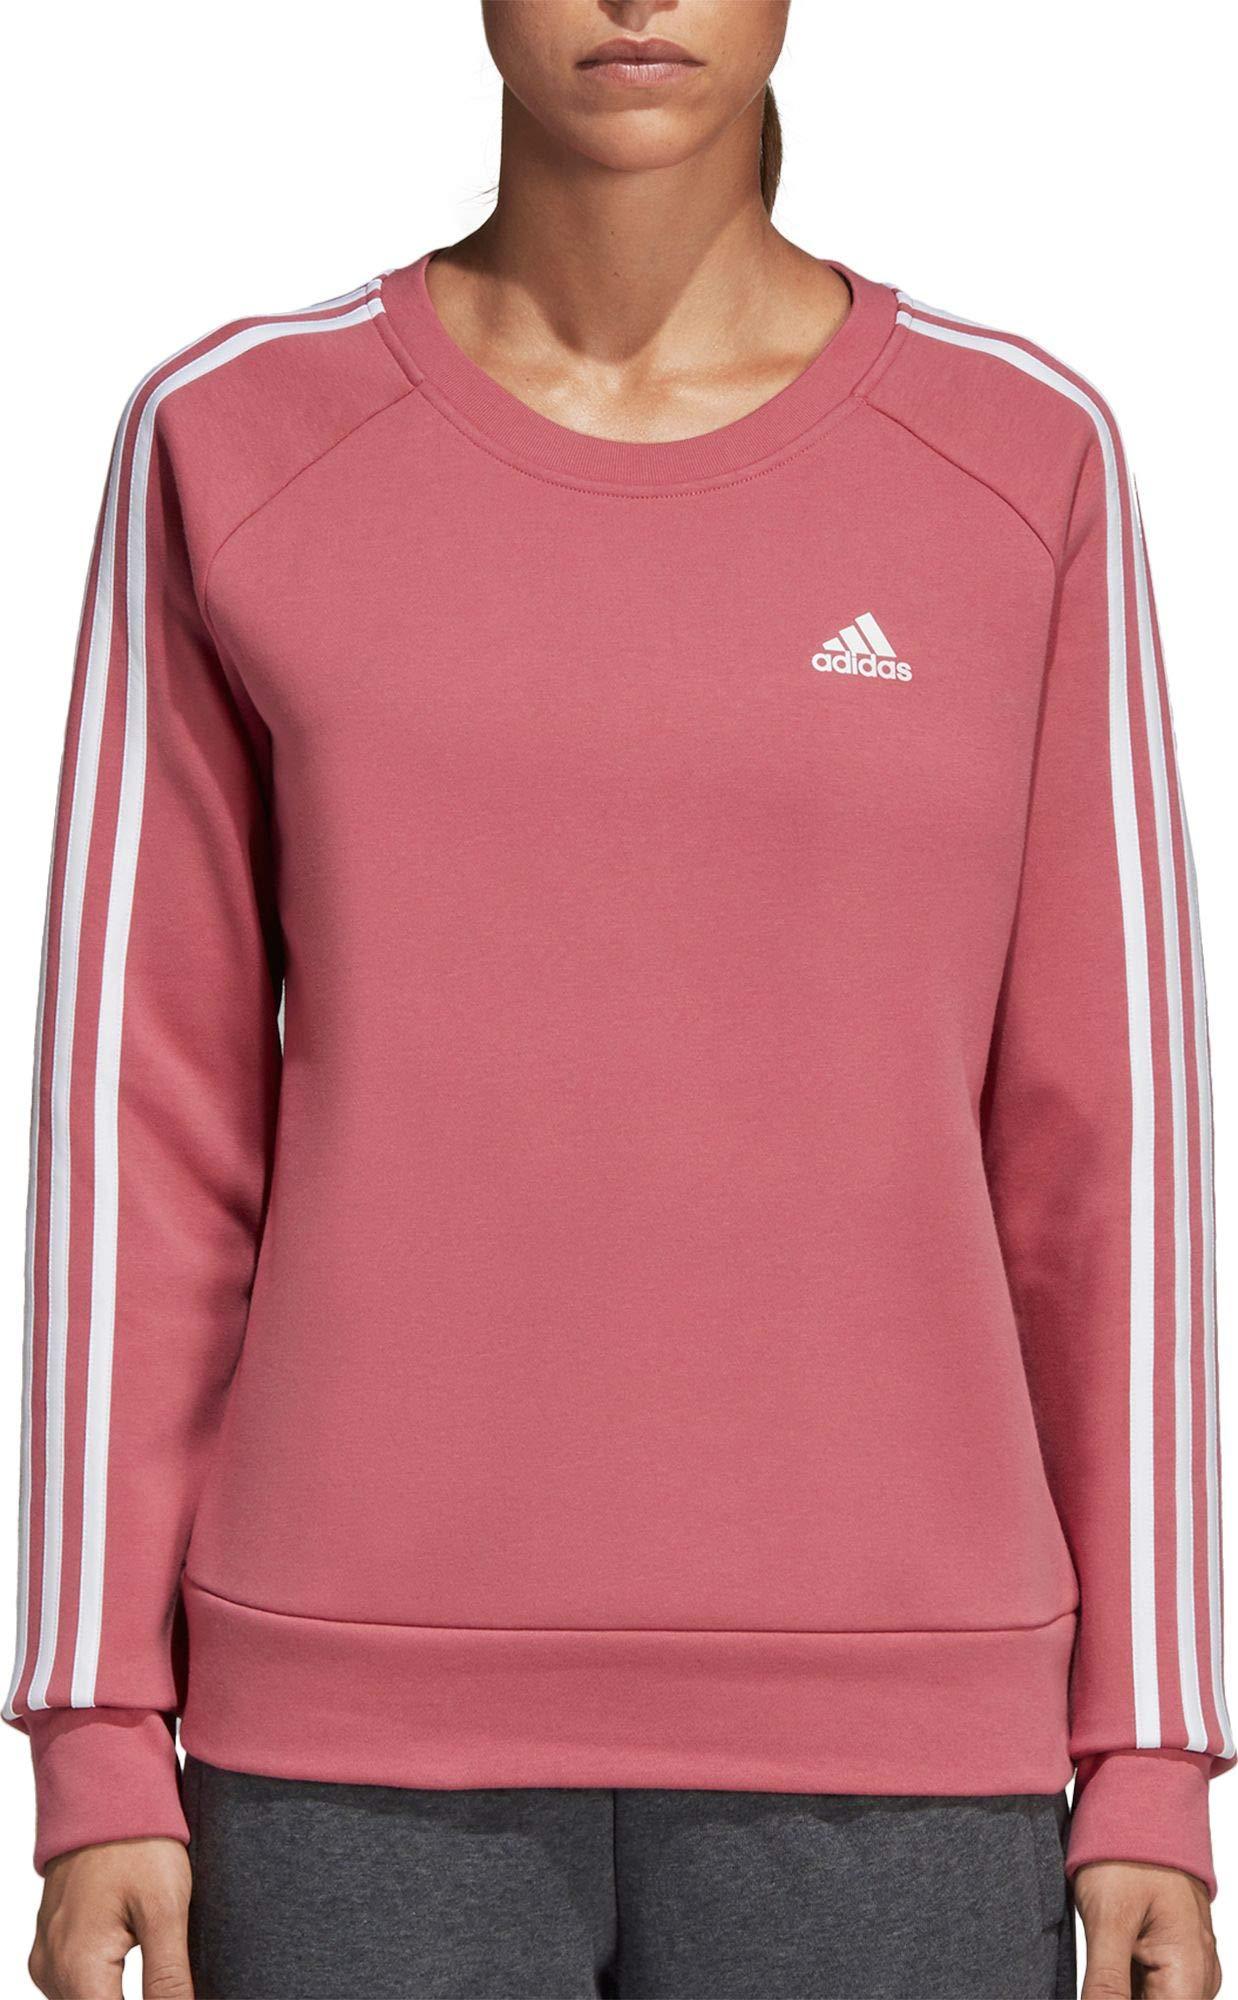 adidas Women's Essentials 3-Stripes Crewneck Sweatshirt (XS, Trace Maroon)